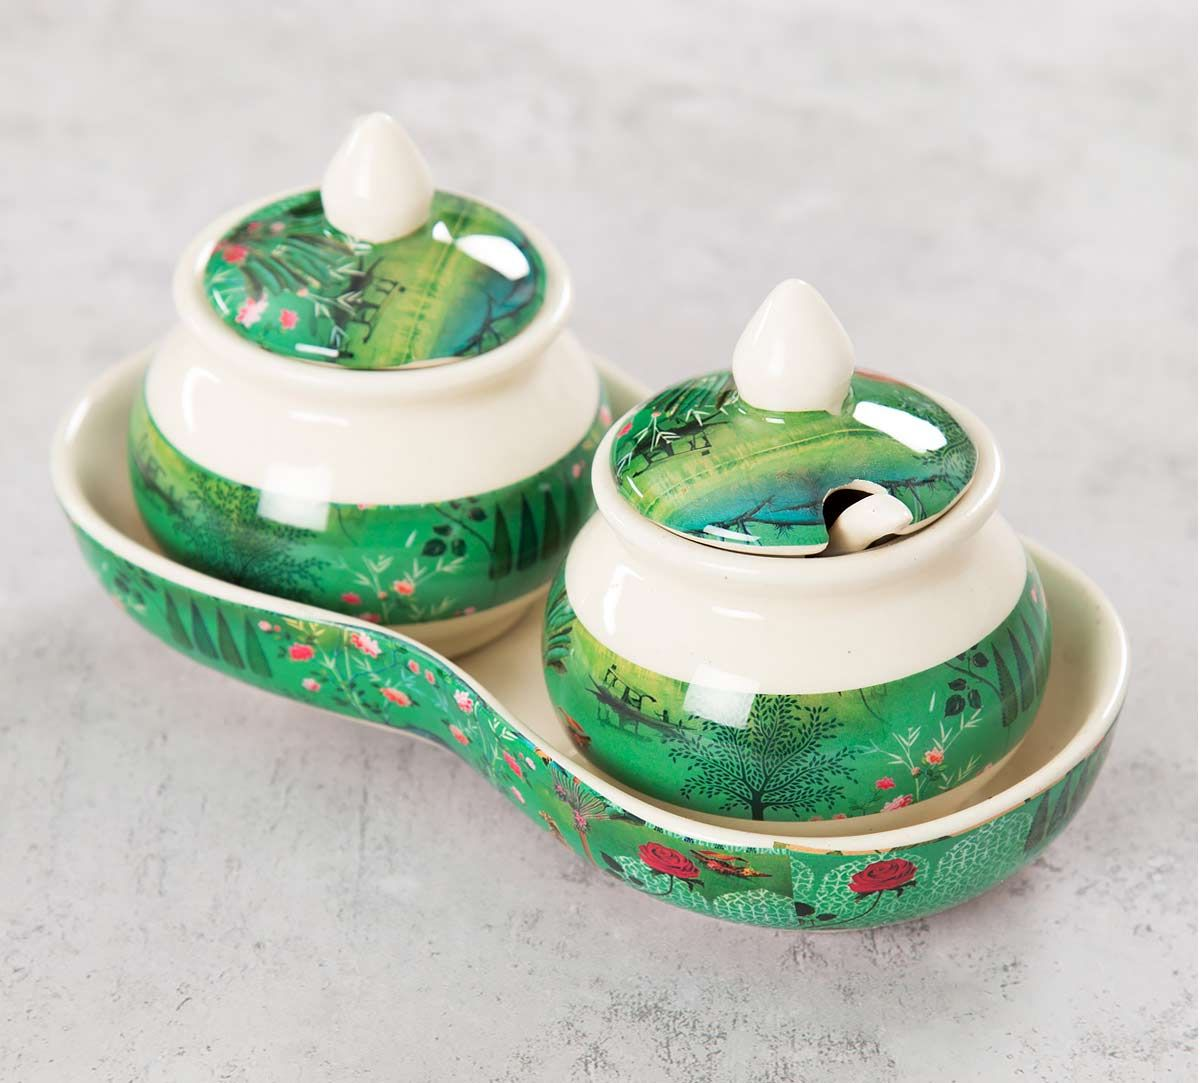 India Circus Whimsical Sundarban Ceramic Pickle Jar